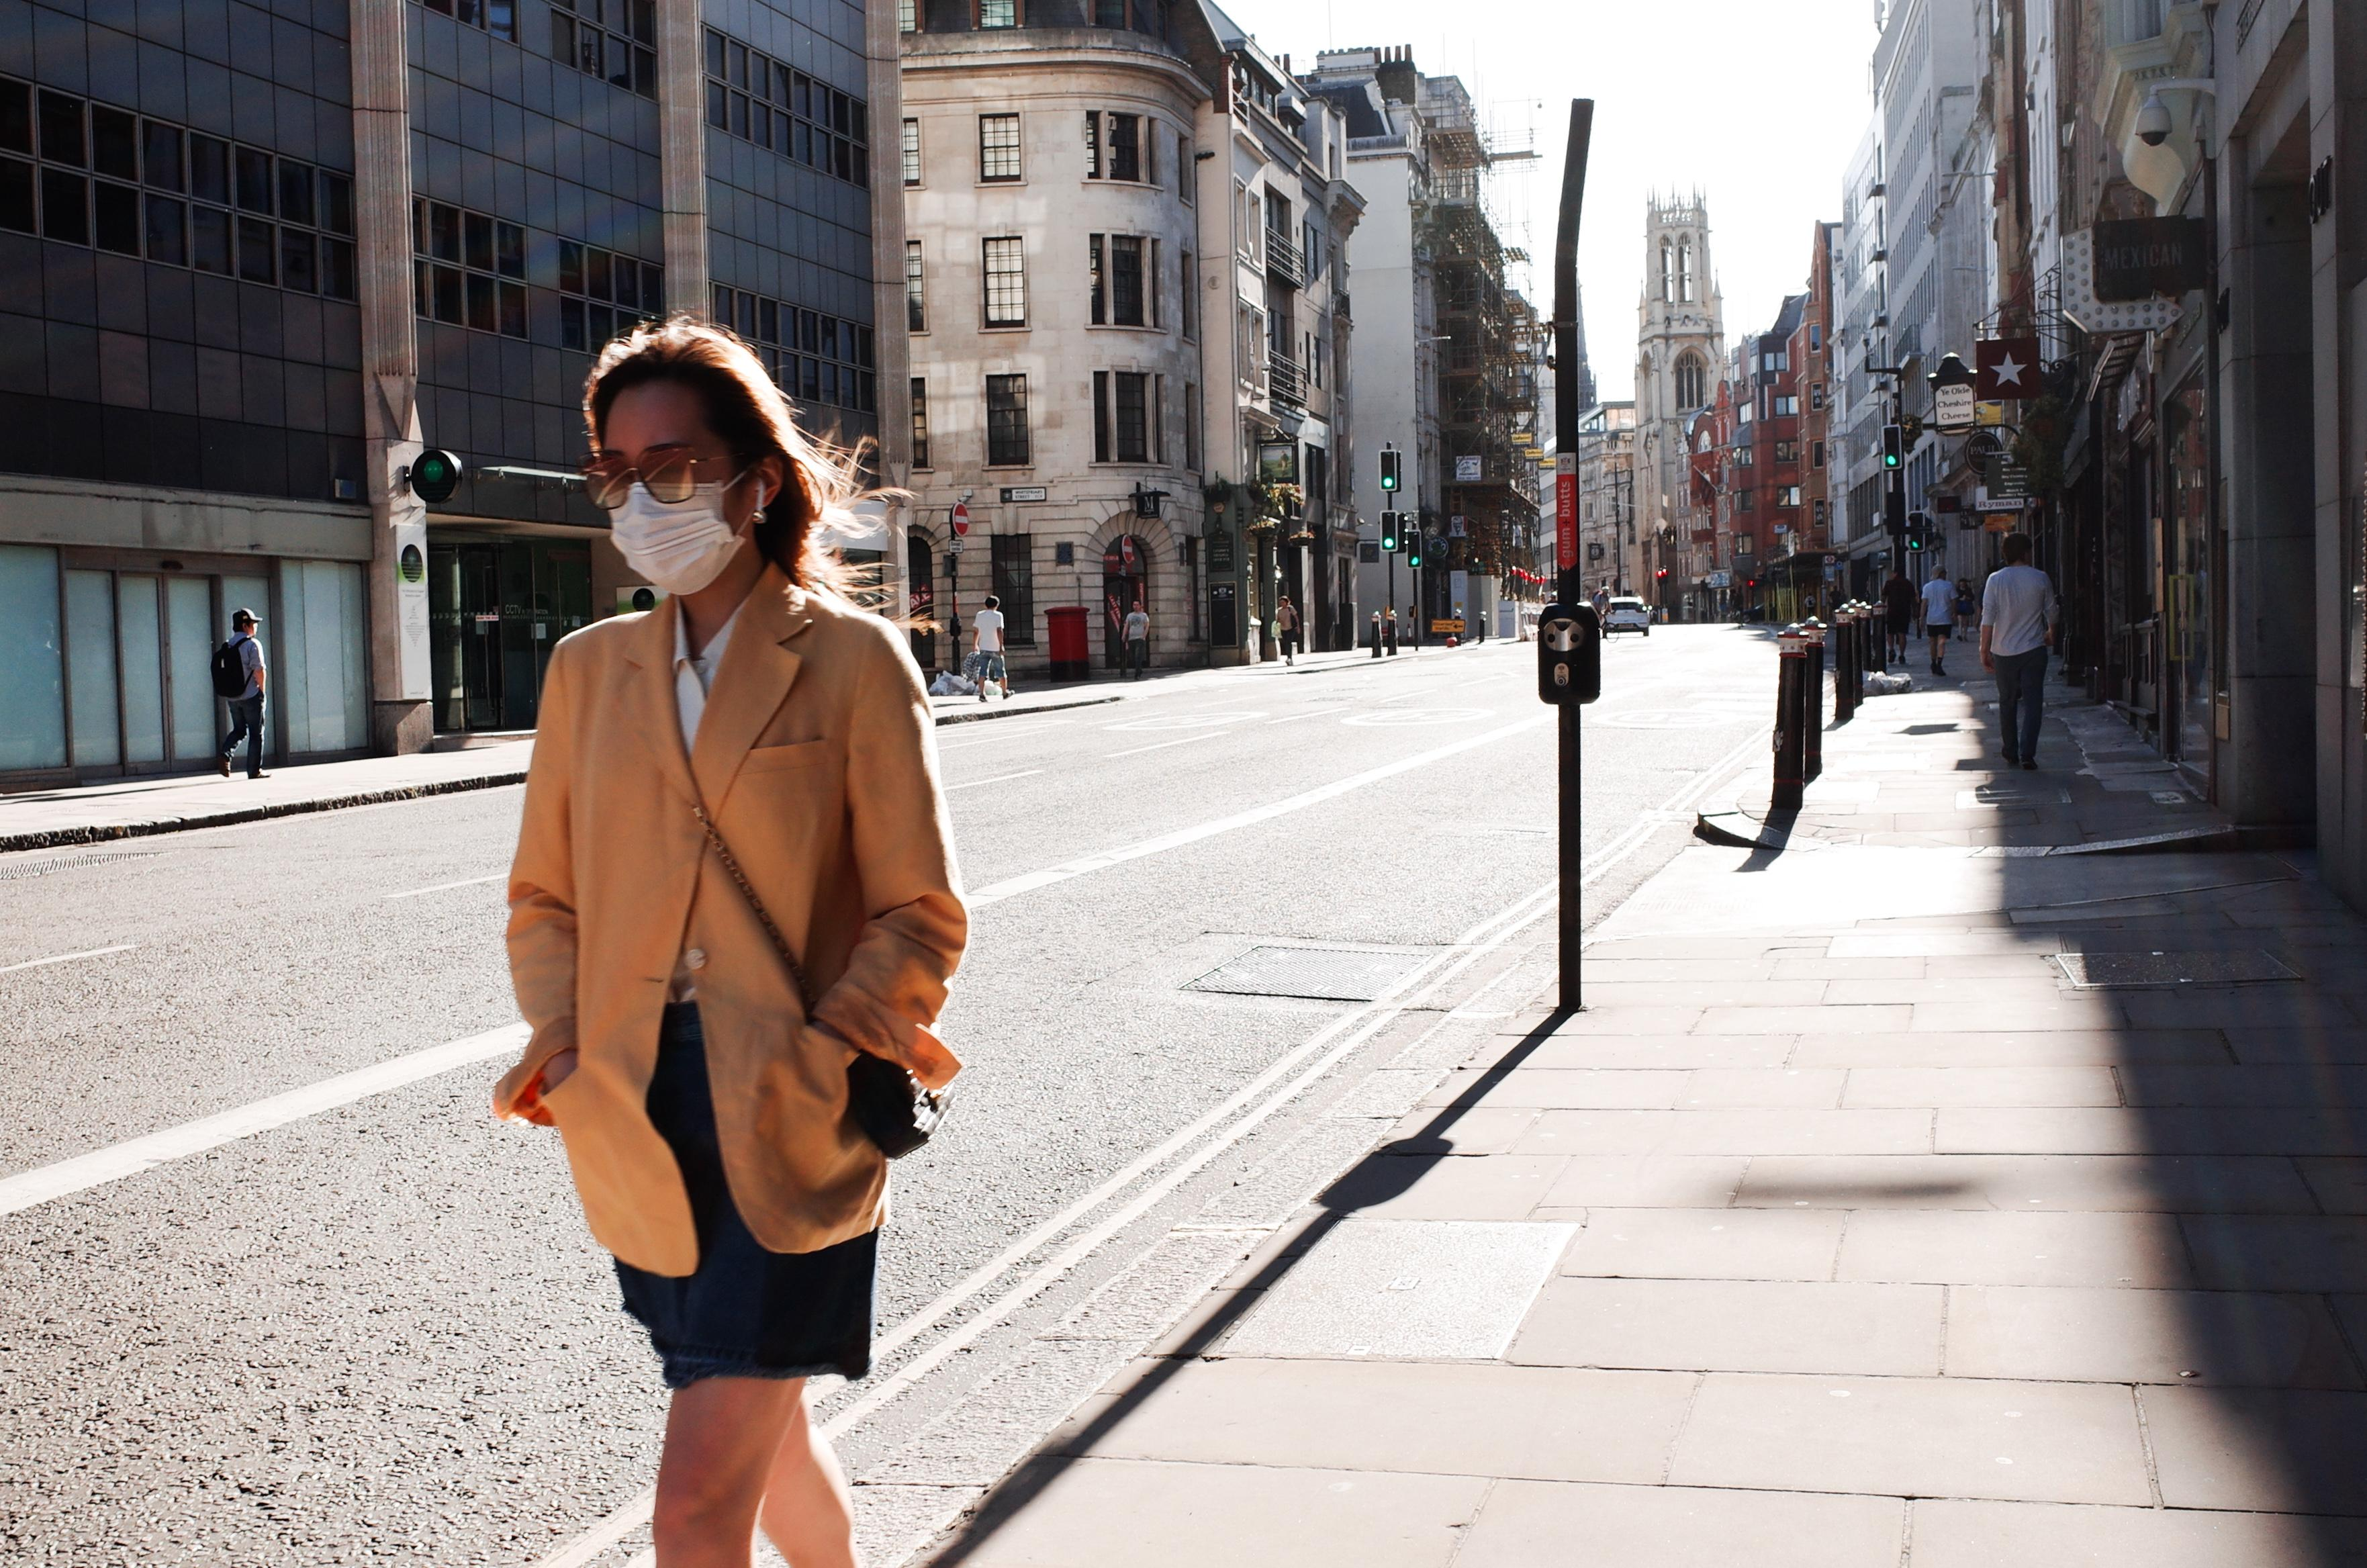 The three places in England with zero new coronavirus cases